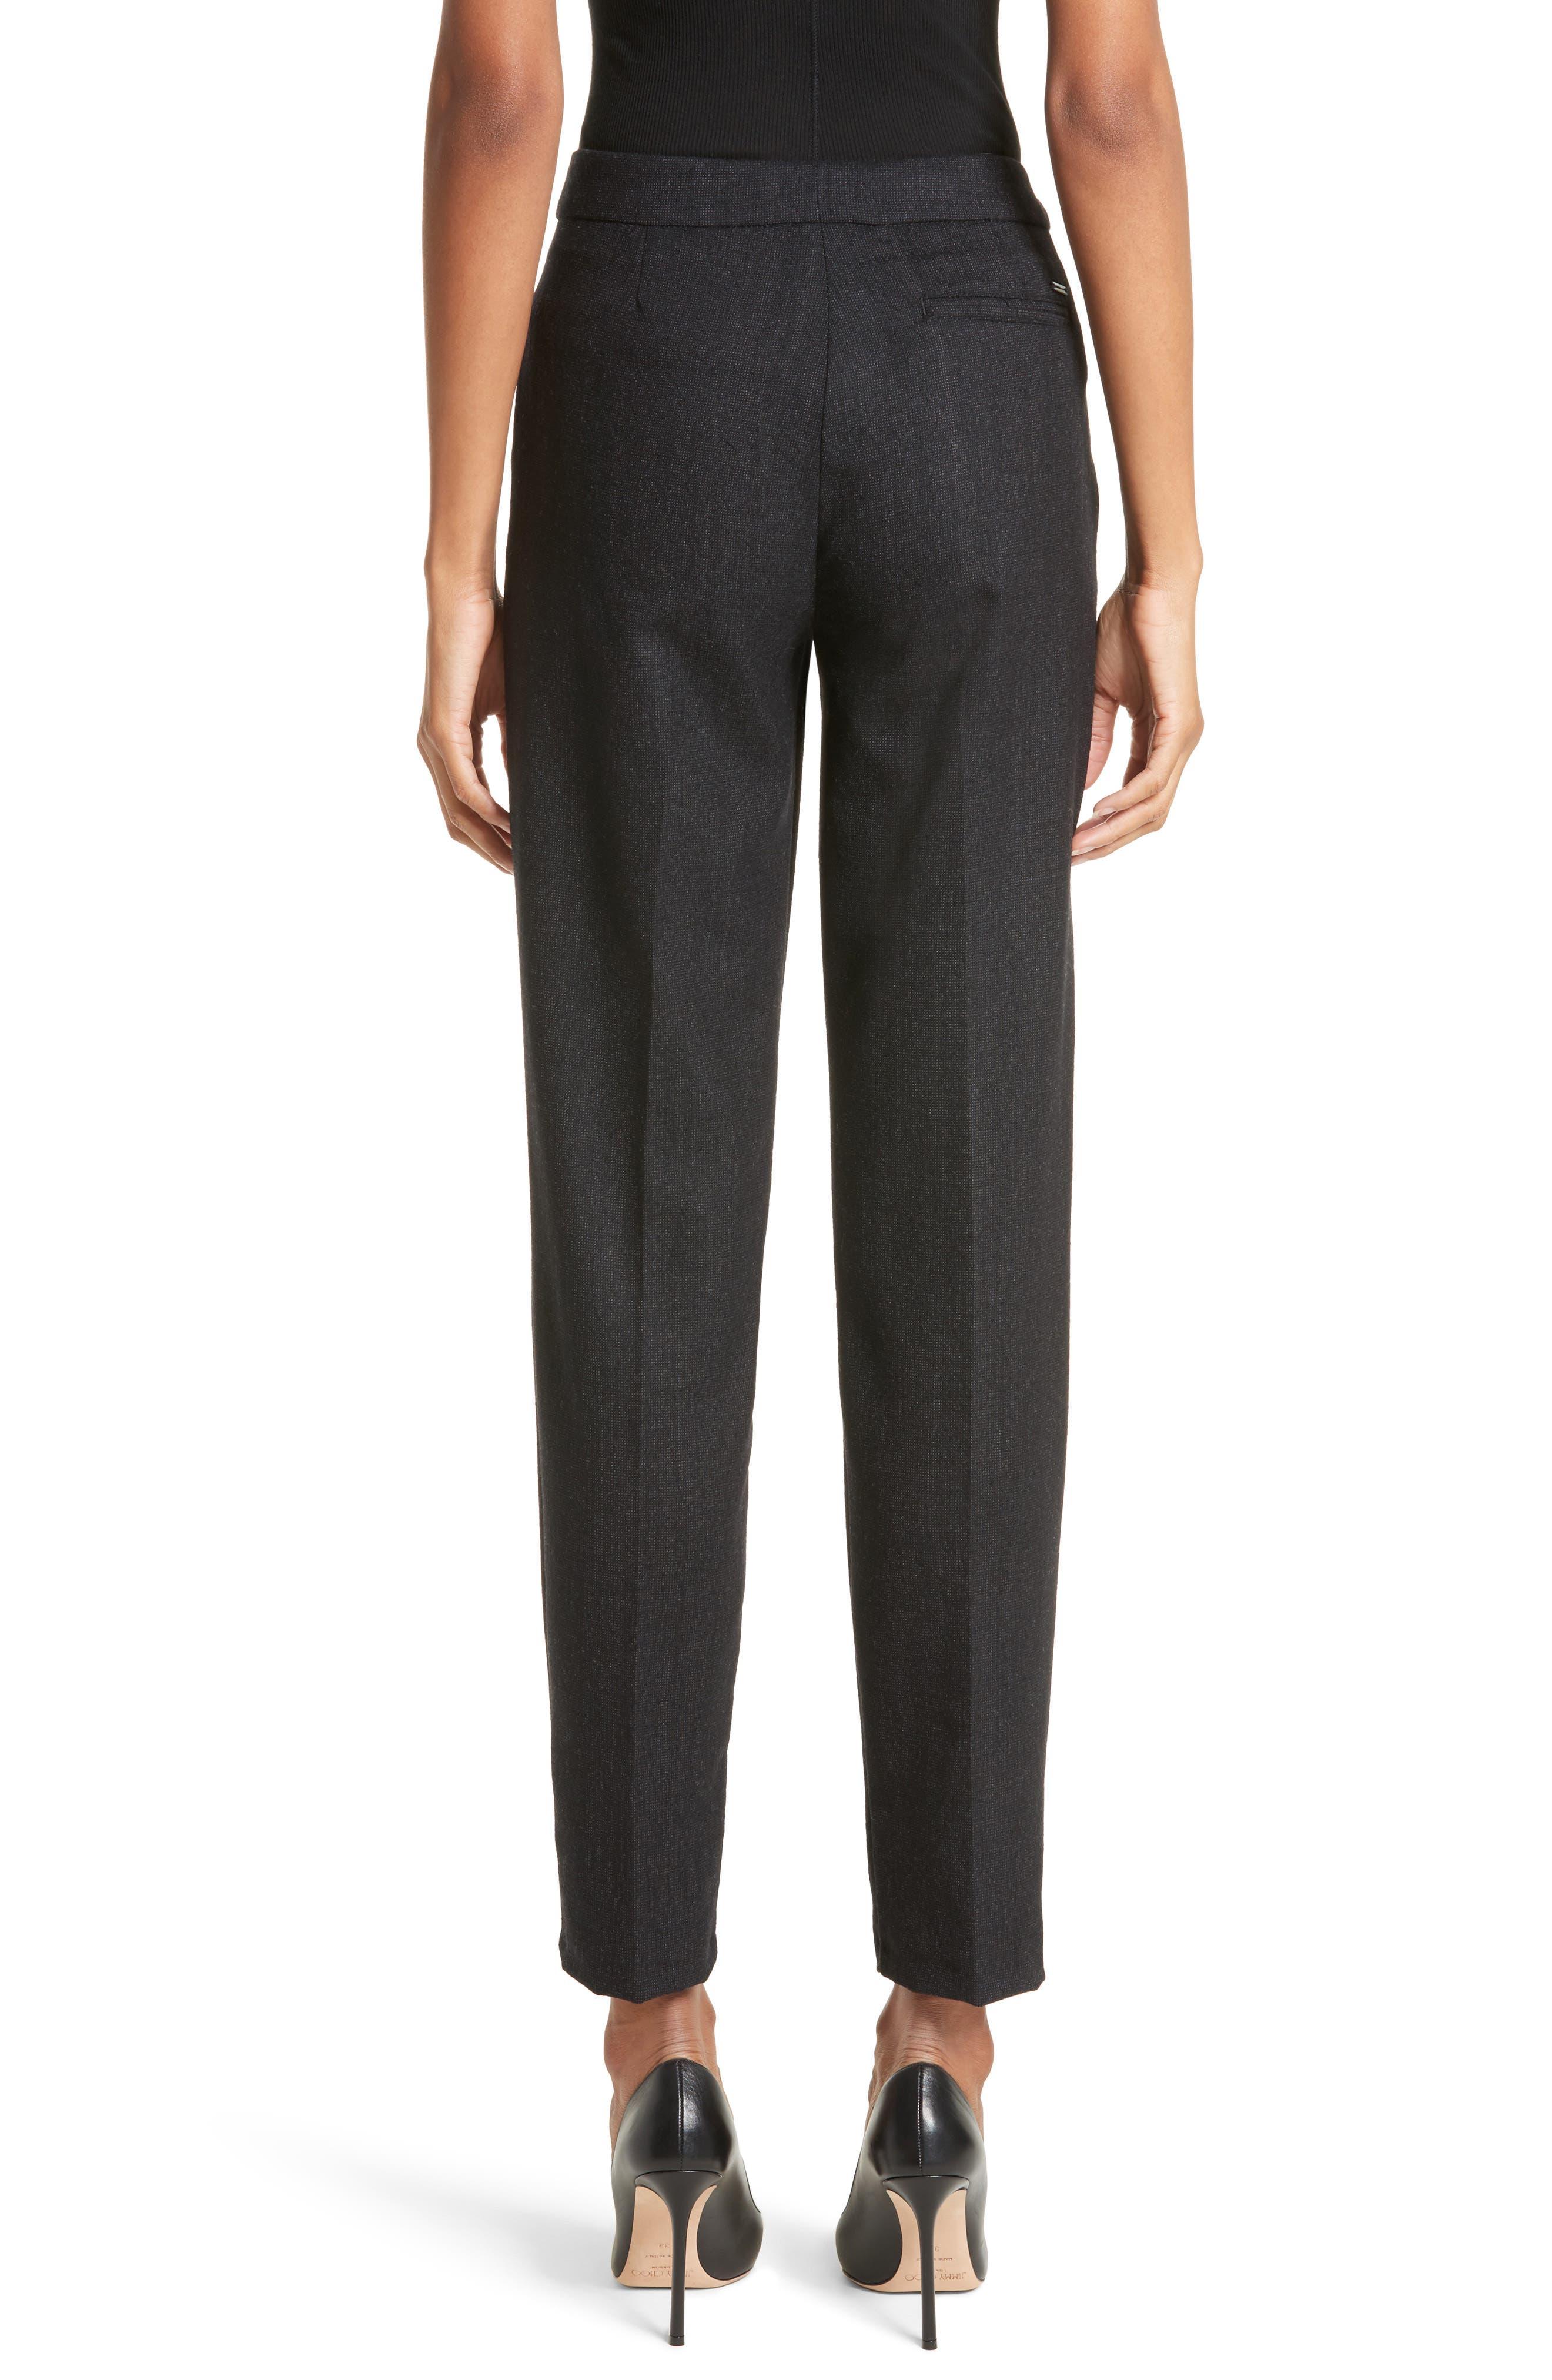 Armani Jeans Stretch Wool Slim Pants,                             Alternate thumbnail 2, color,                             001